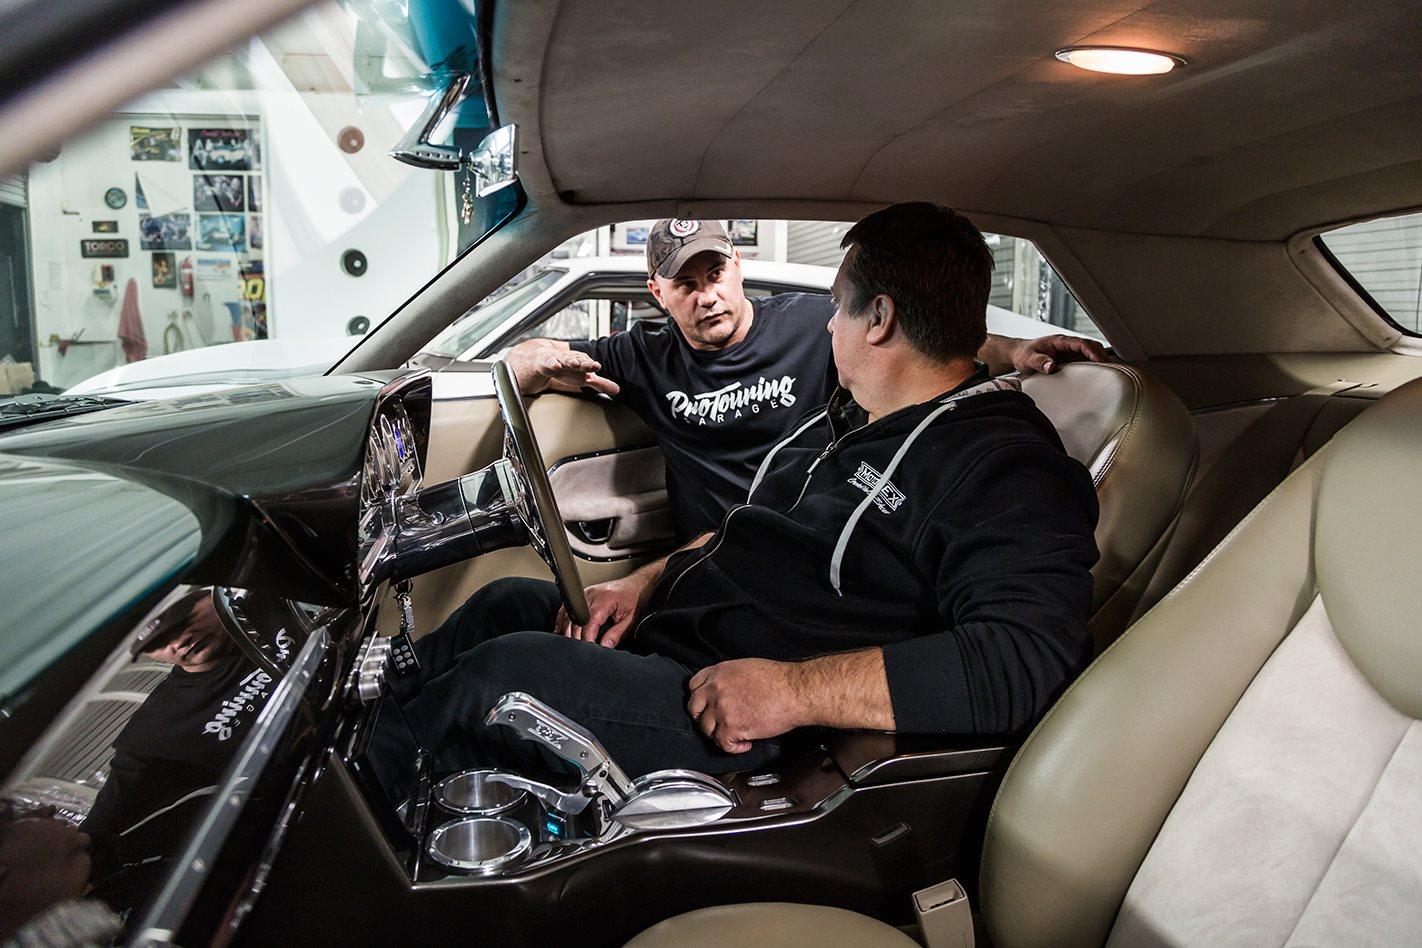 King Kong Cuda driver's seat